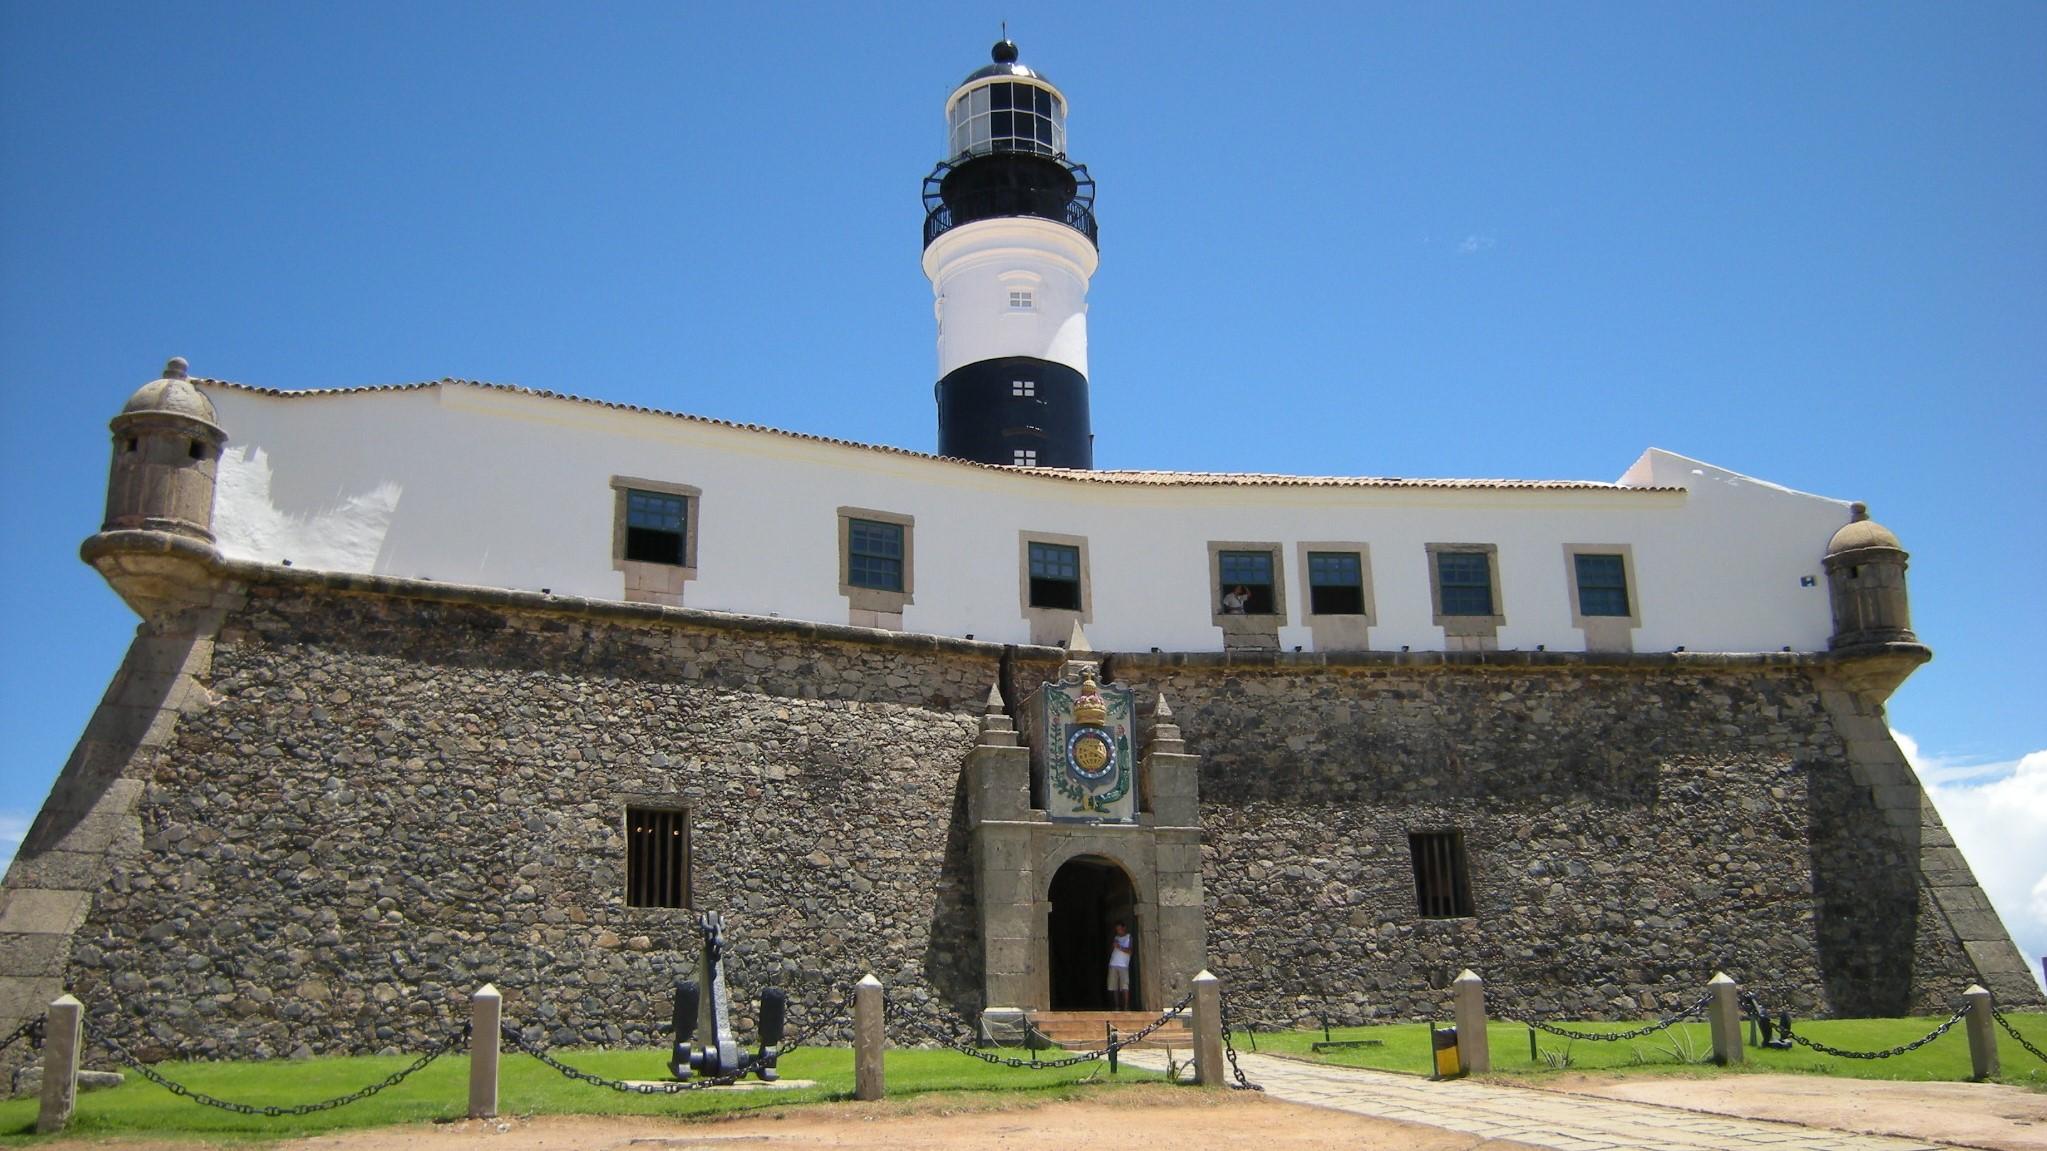 Farol de Barra - Salvador de Bahia